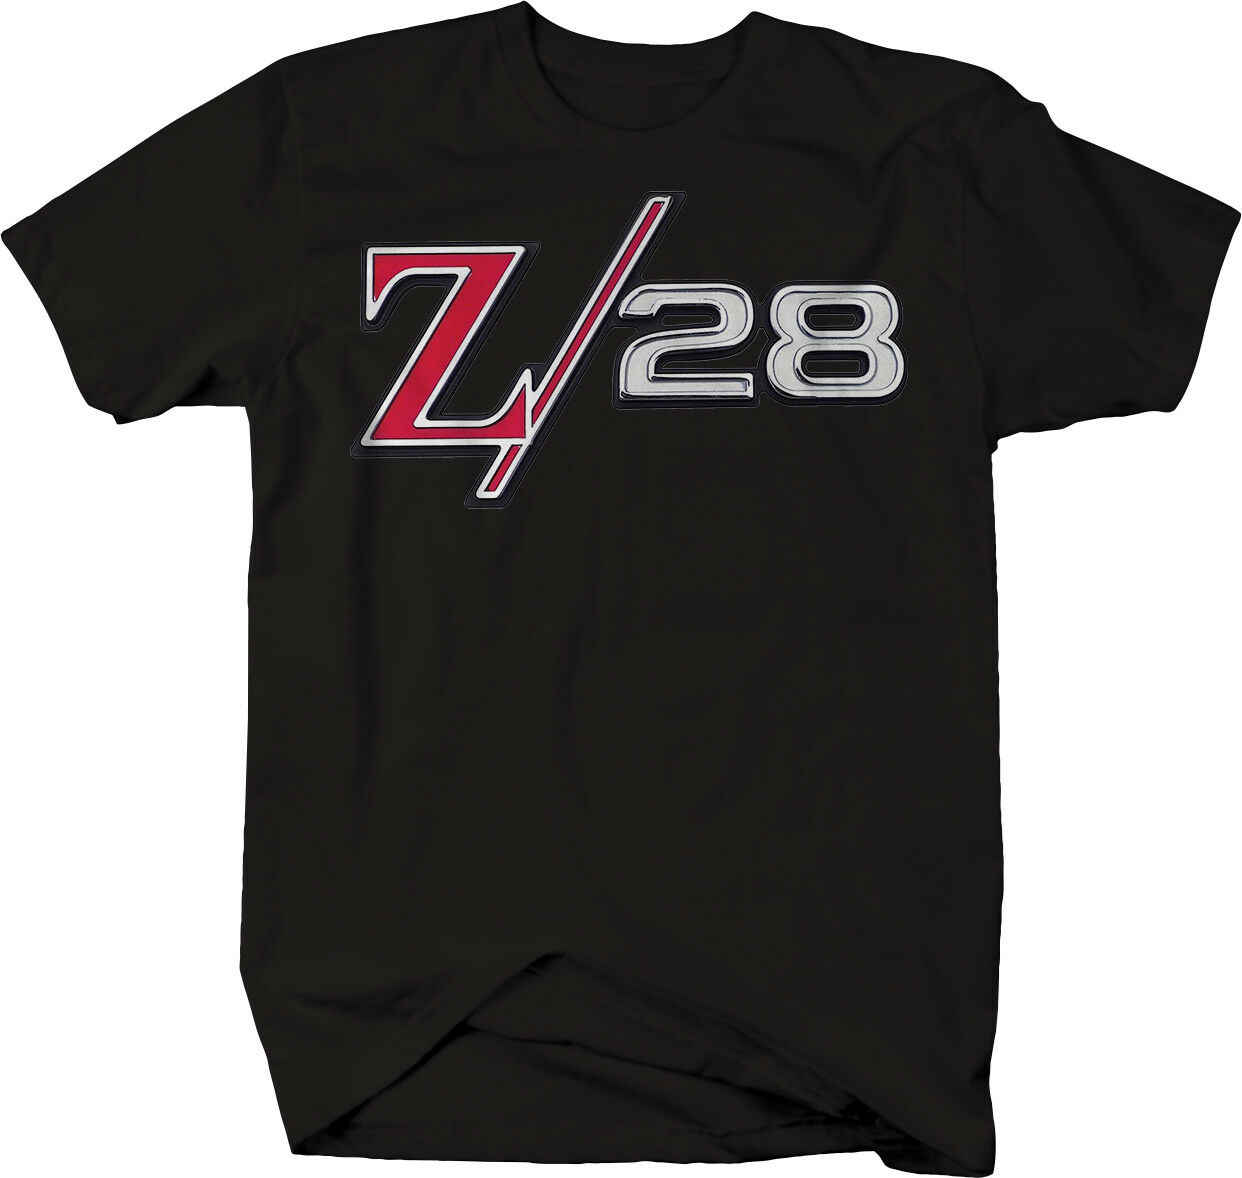 Camaro Z/28 Z28 классический эмблема логотип мышц (машинки)